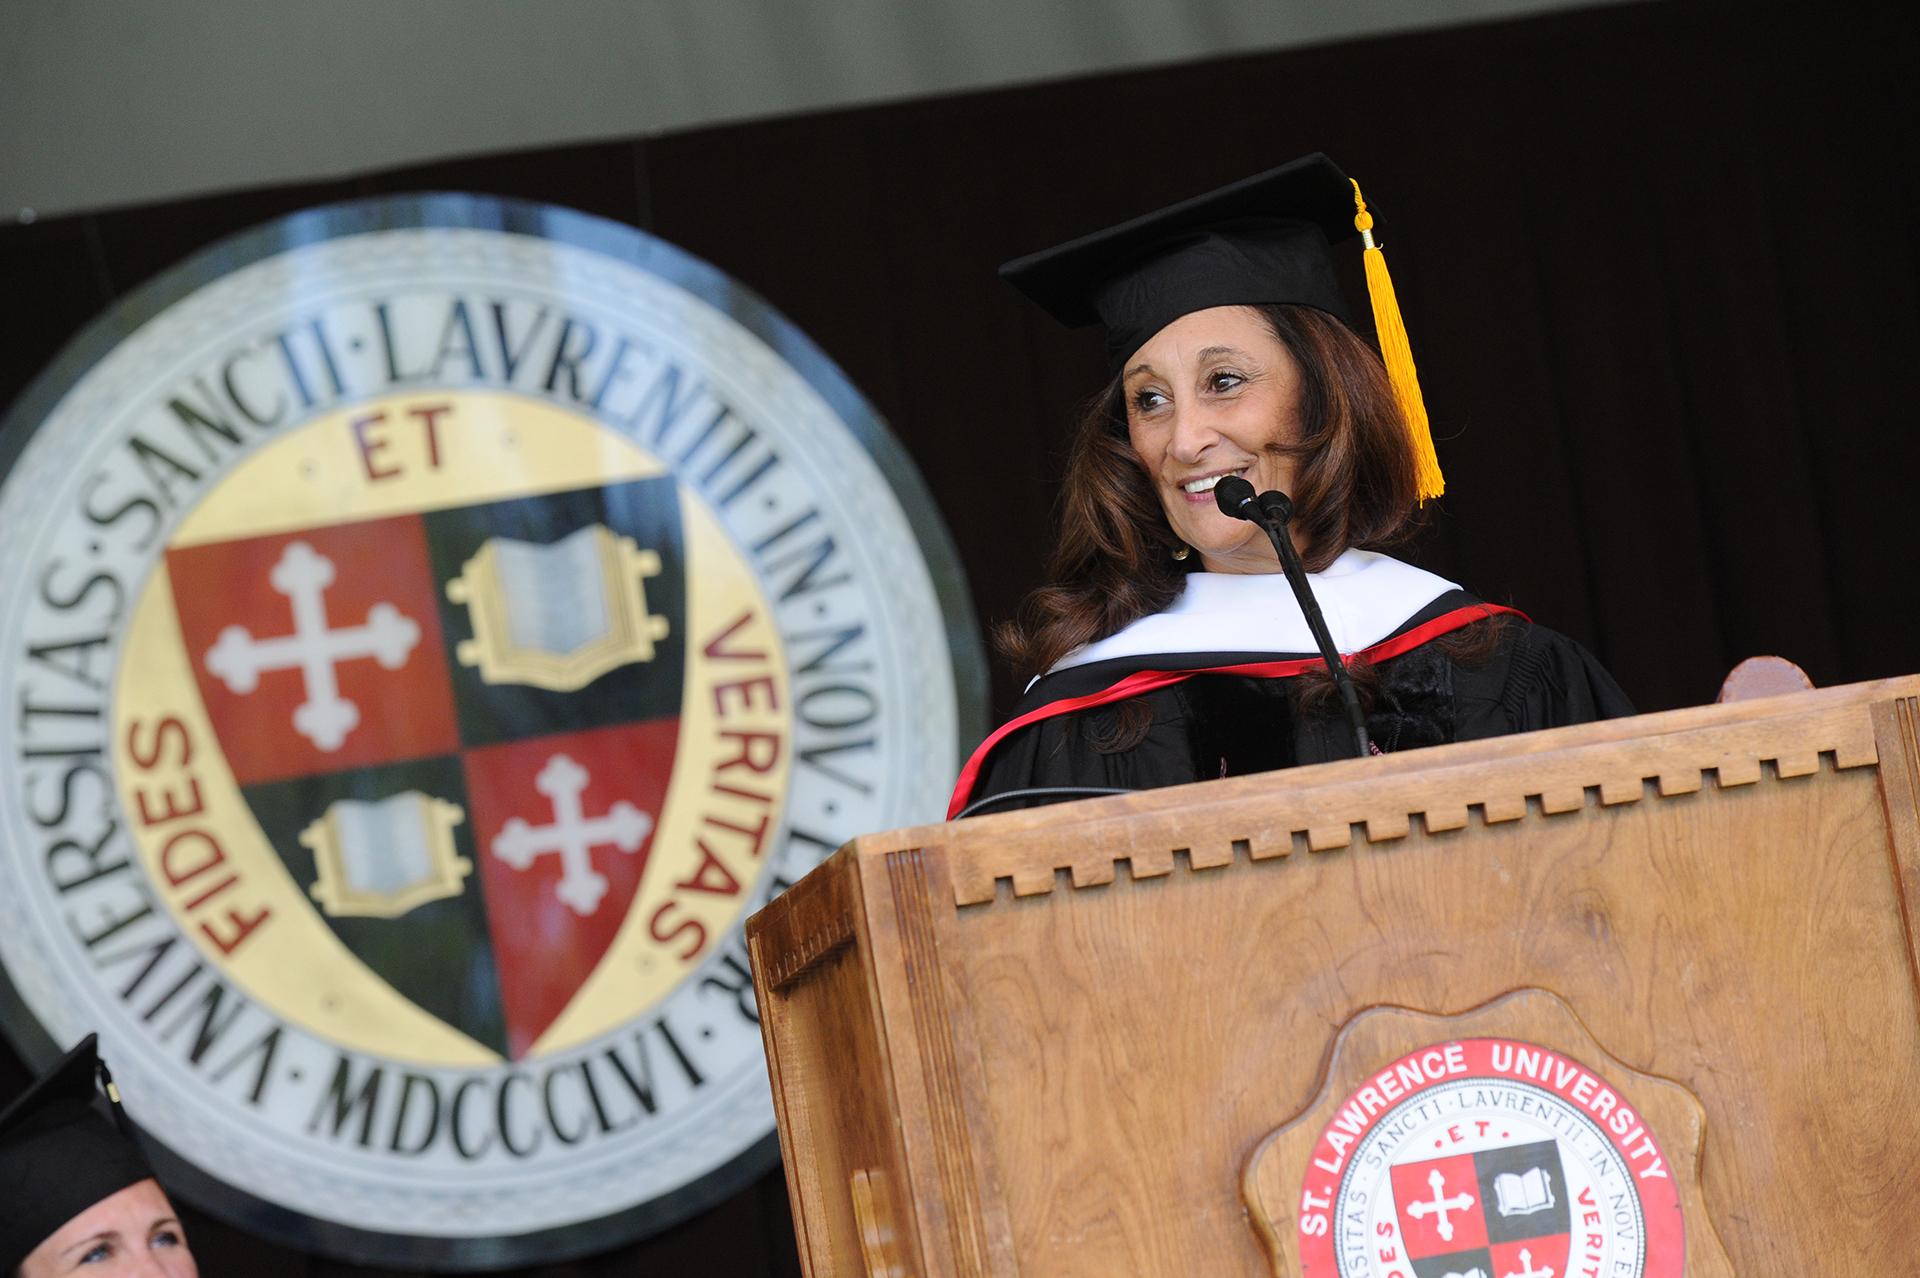 Susan Talve '74 speaking at 2014 Commencement